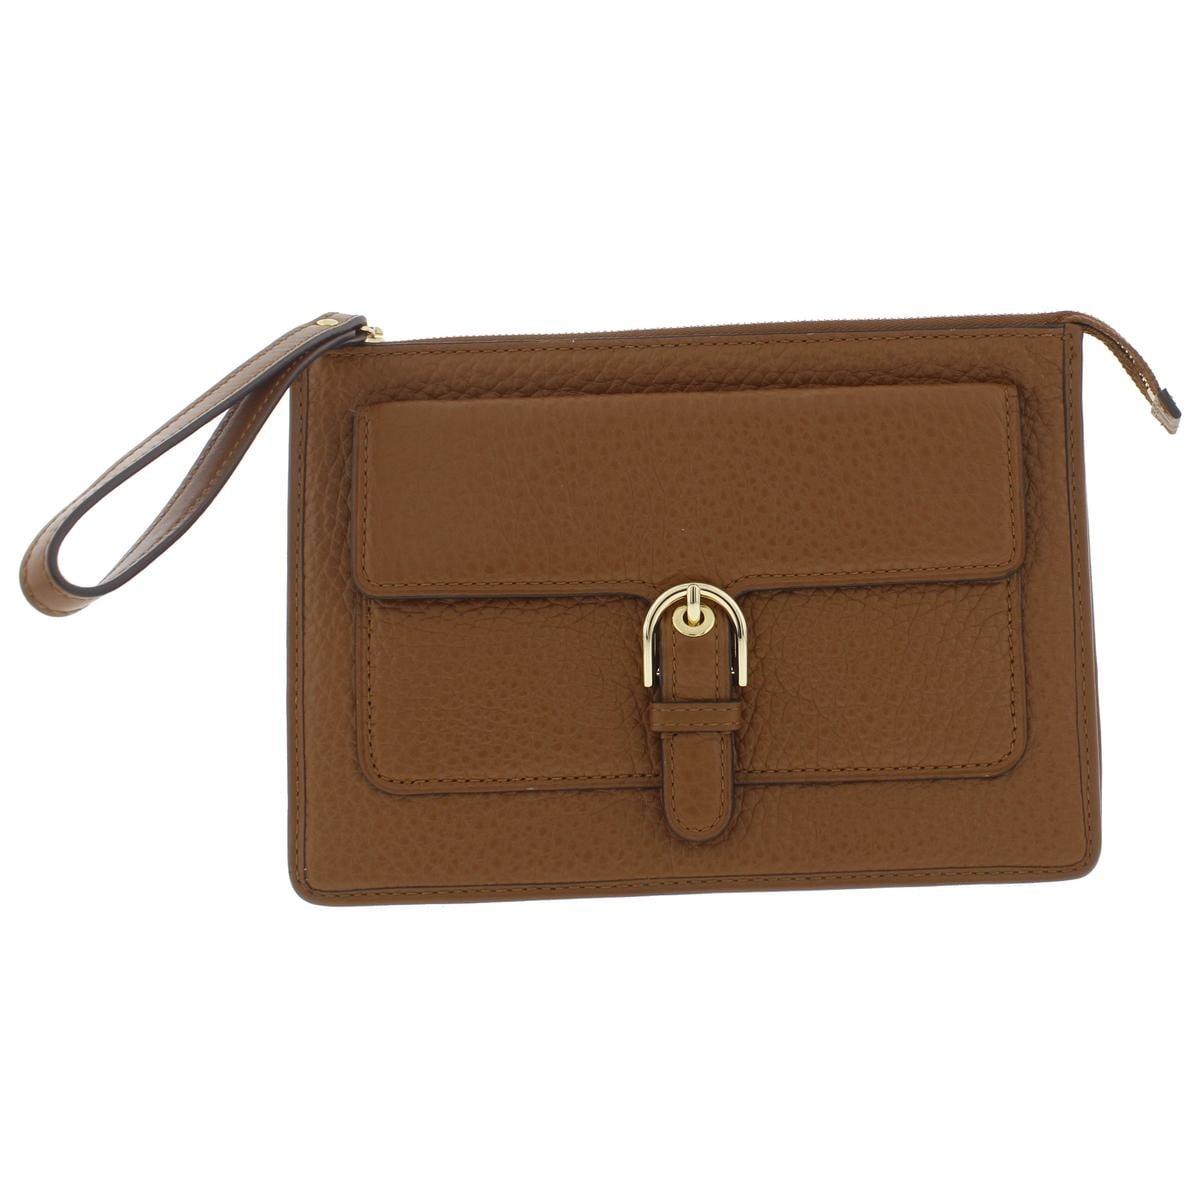 859c088a47d792 Shop MICHAEL Michael Kors Womens Cooper Wristlet Handbag Leather Pebbled -  MEDIUM - Free Shipping Today - Overstock - 19822091